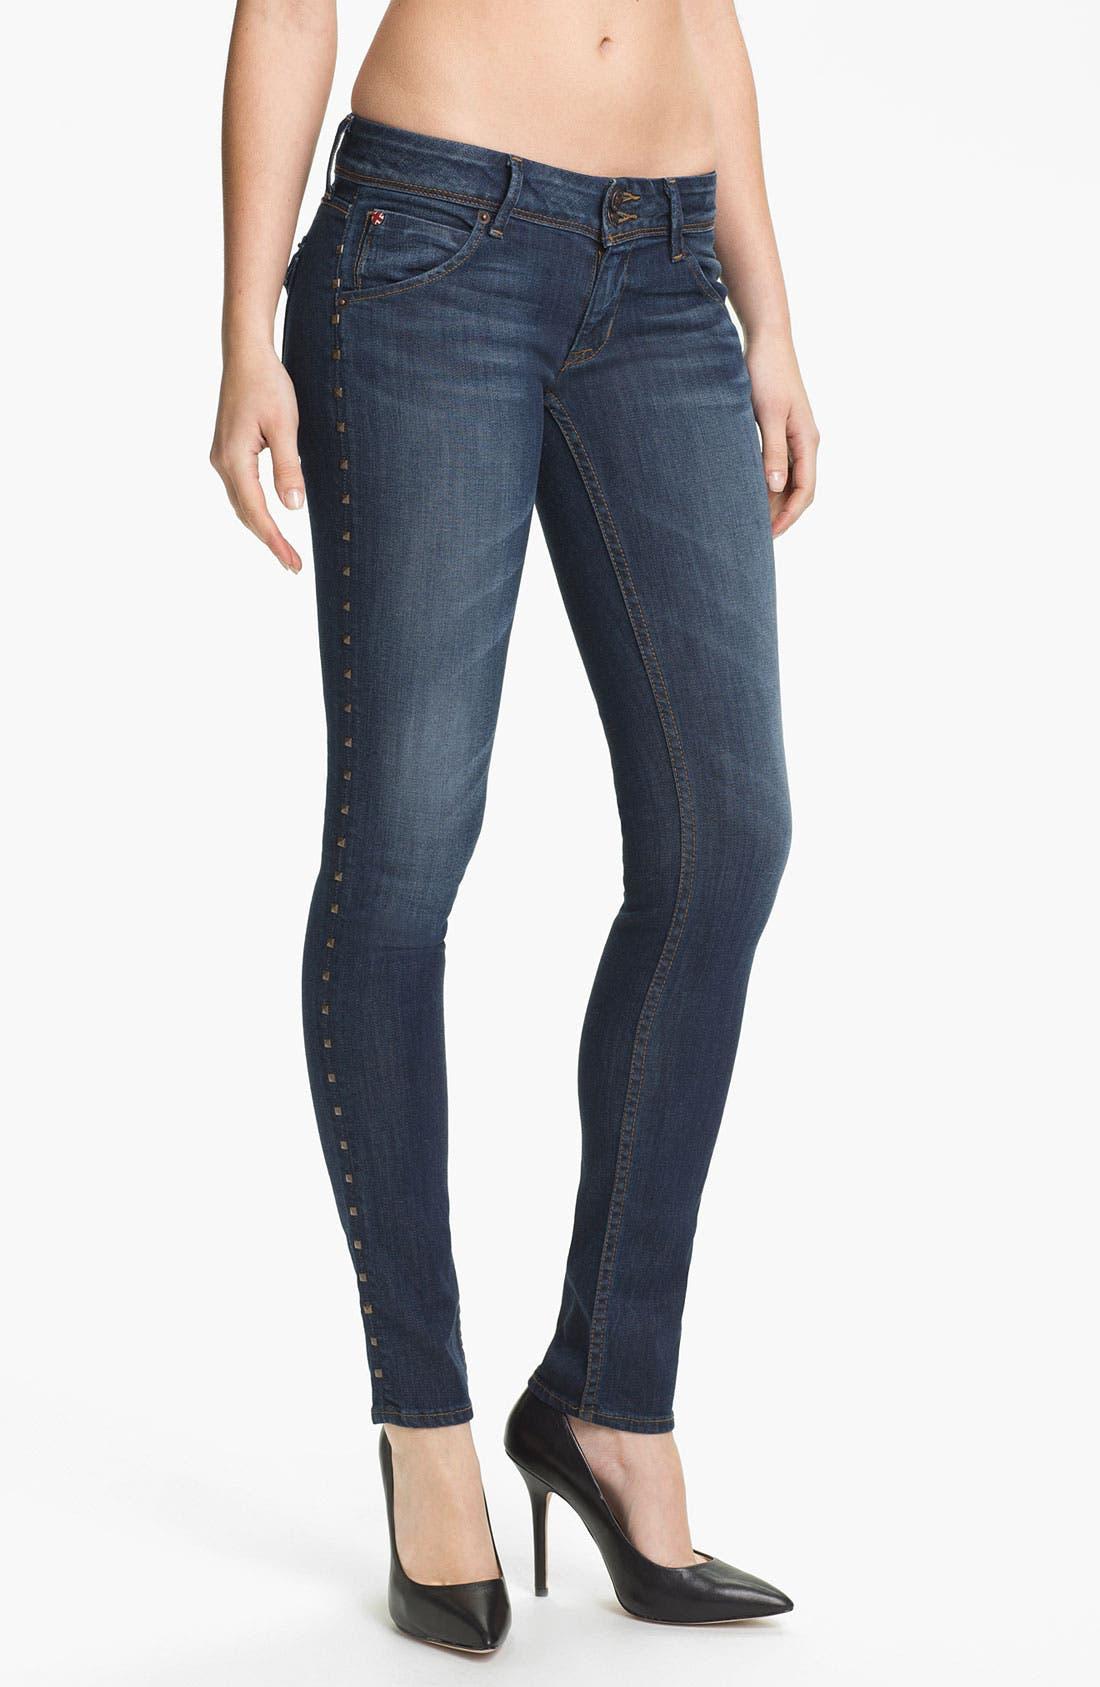 Alternate Image 1 Selected - Hudson Jeans 'Collin' Skinny Stretch Jeans (Bennett)